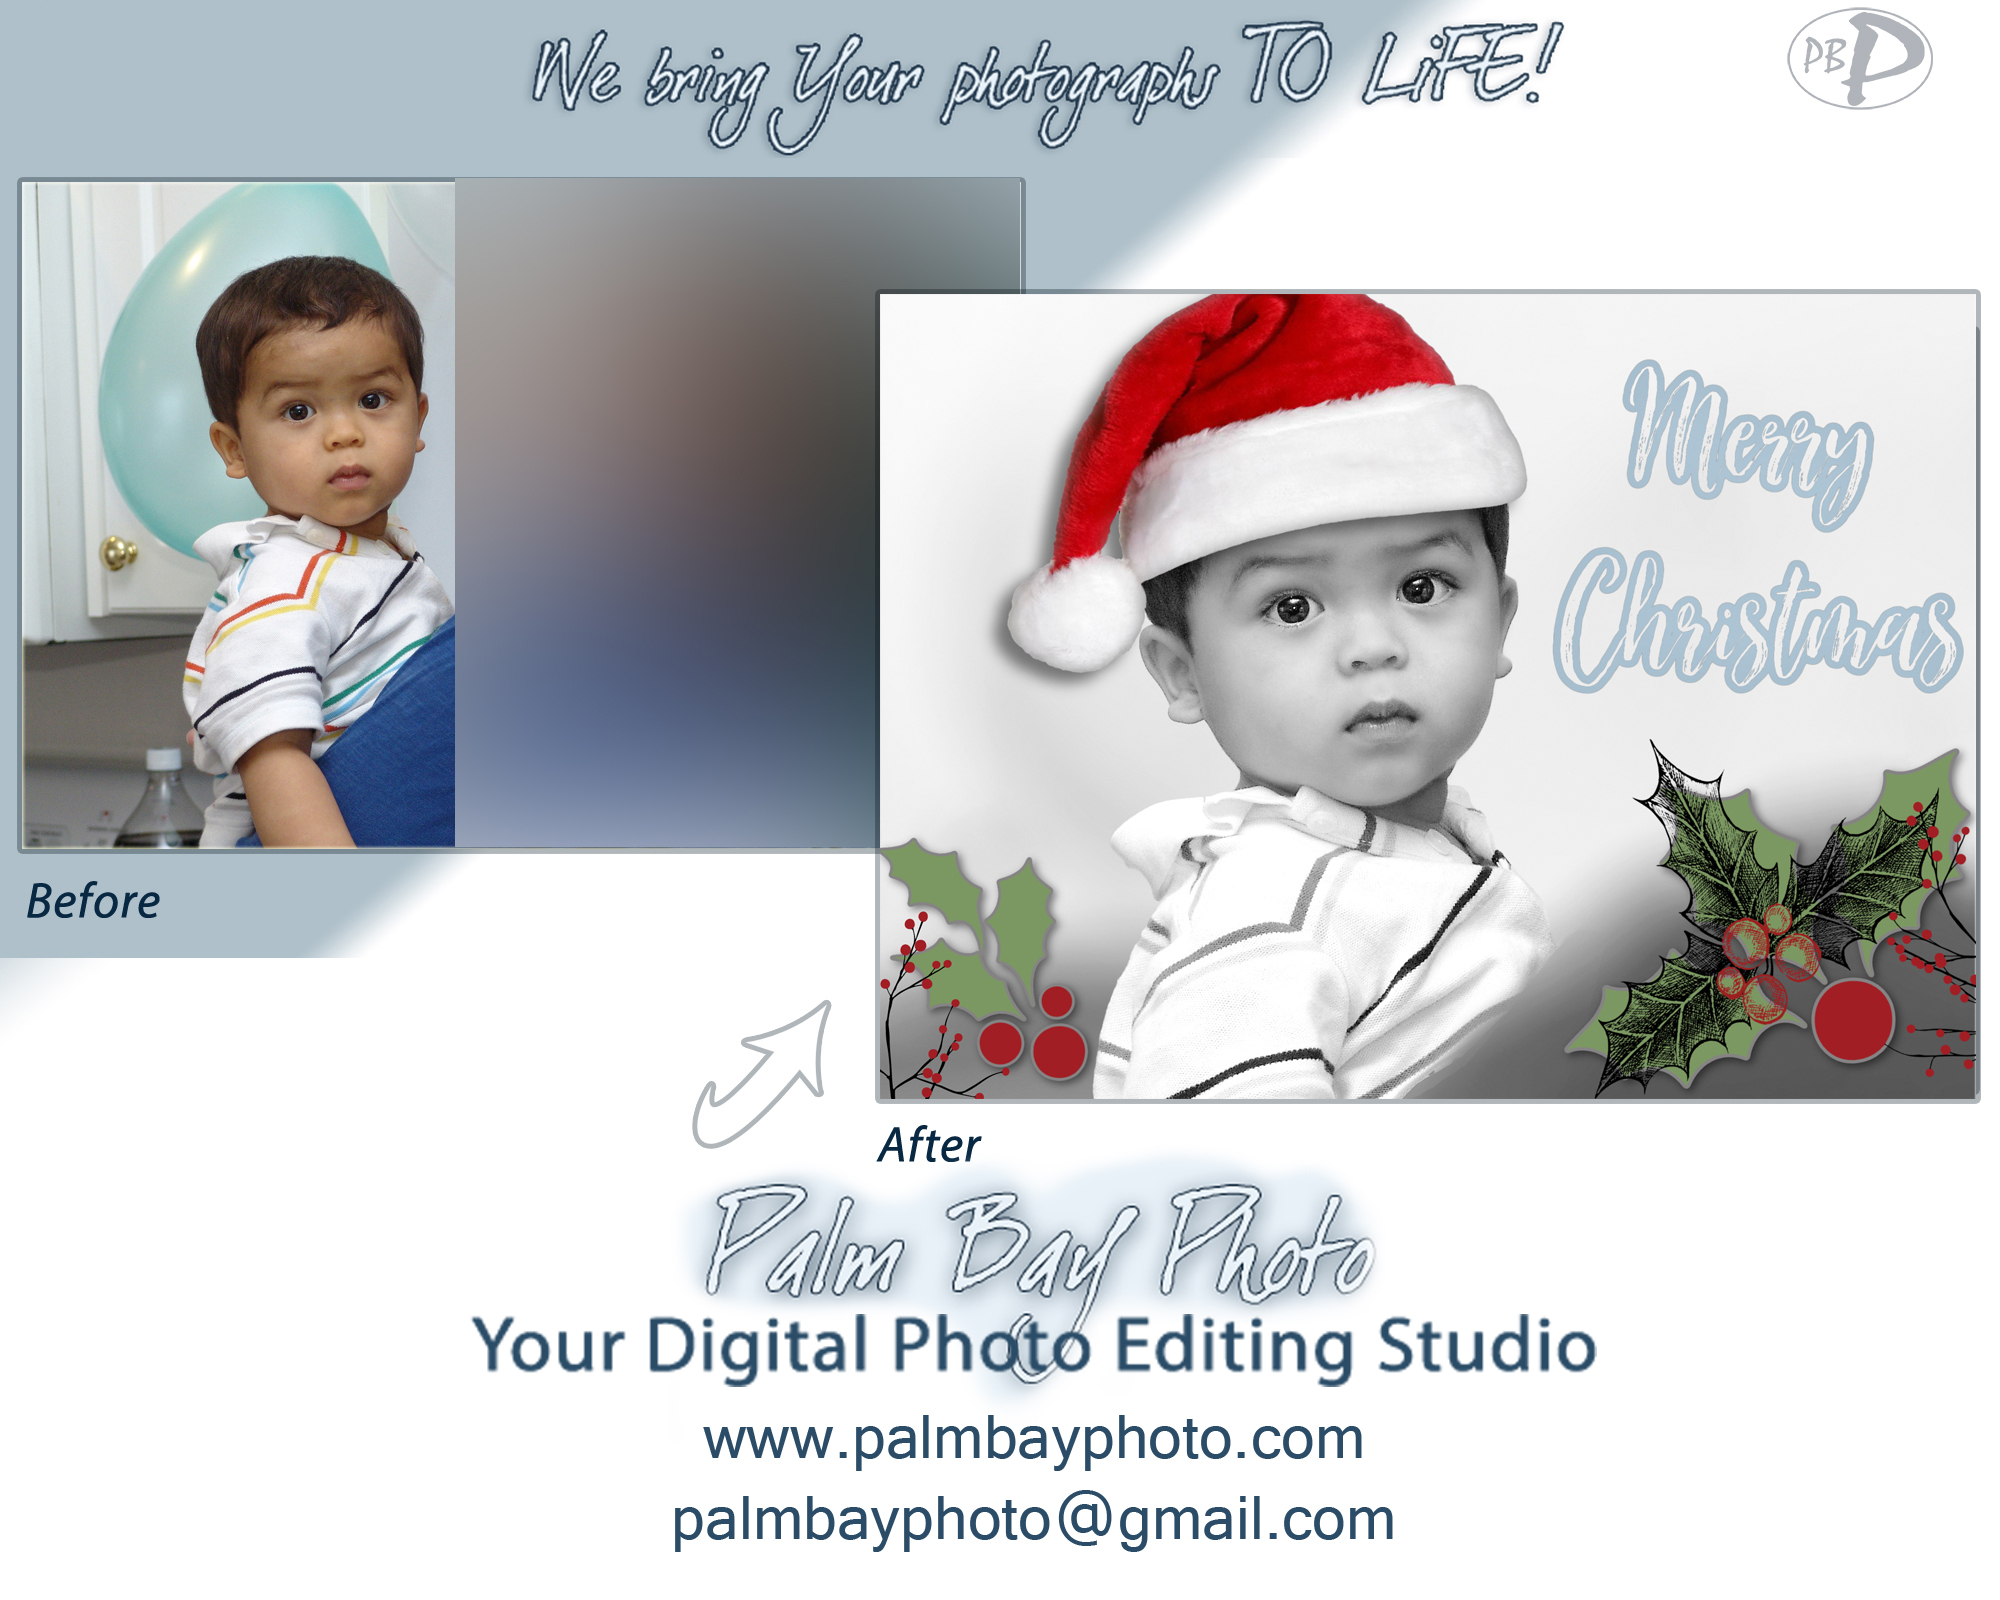 Palm Bay Photo Studio Editing